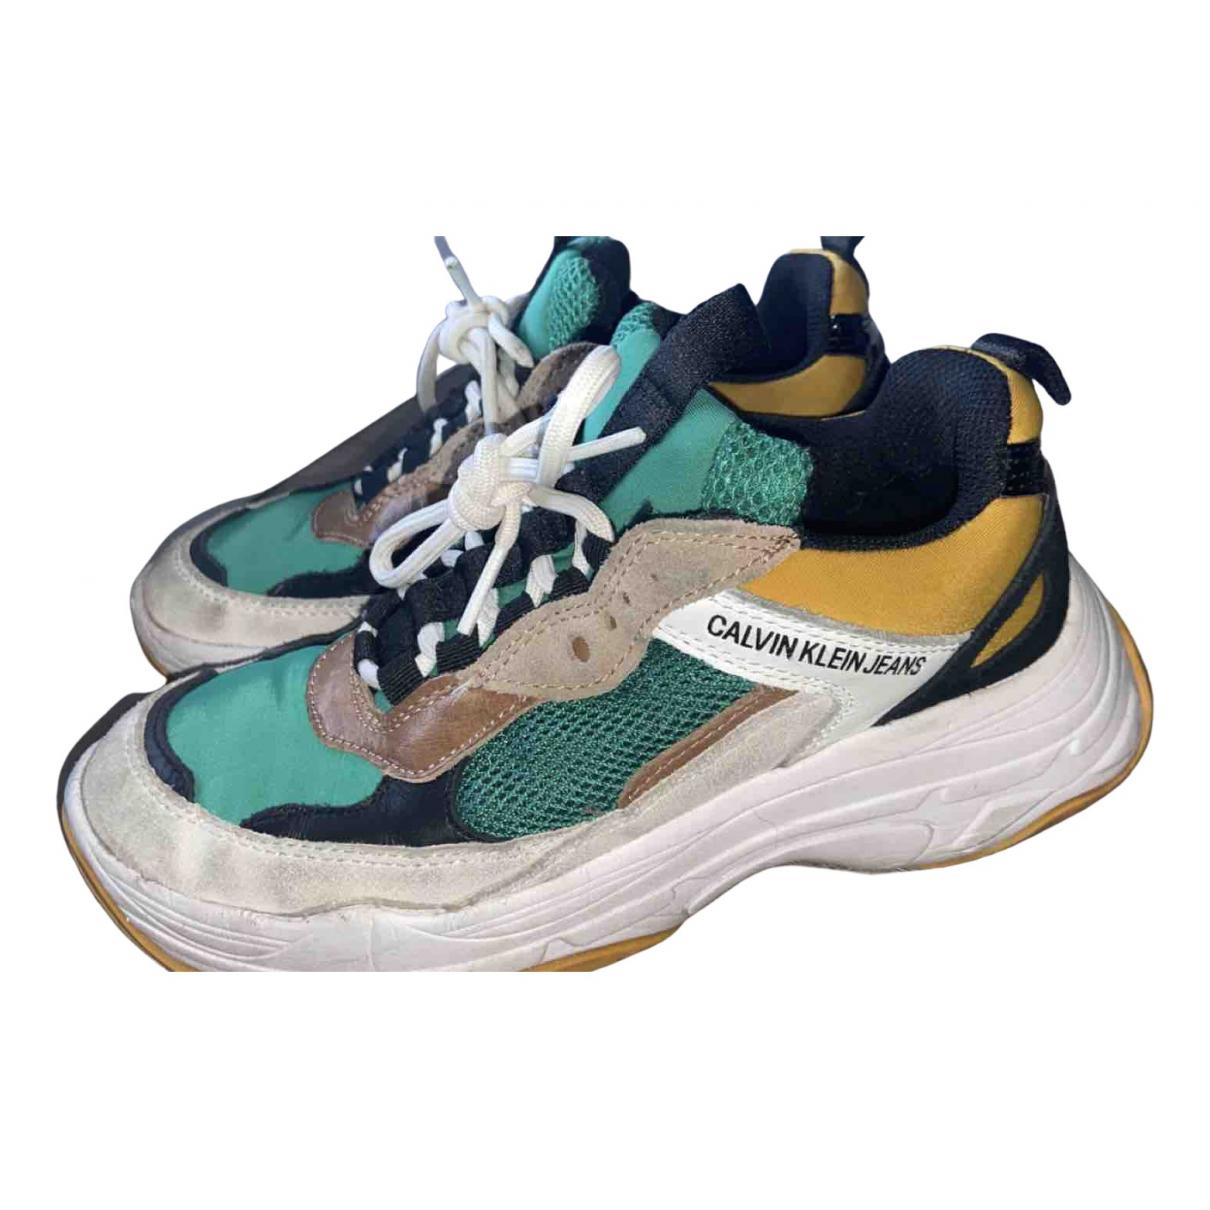 Calvin Klein \N Sneakers in  Gruen Polyester